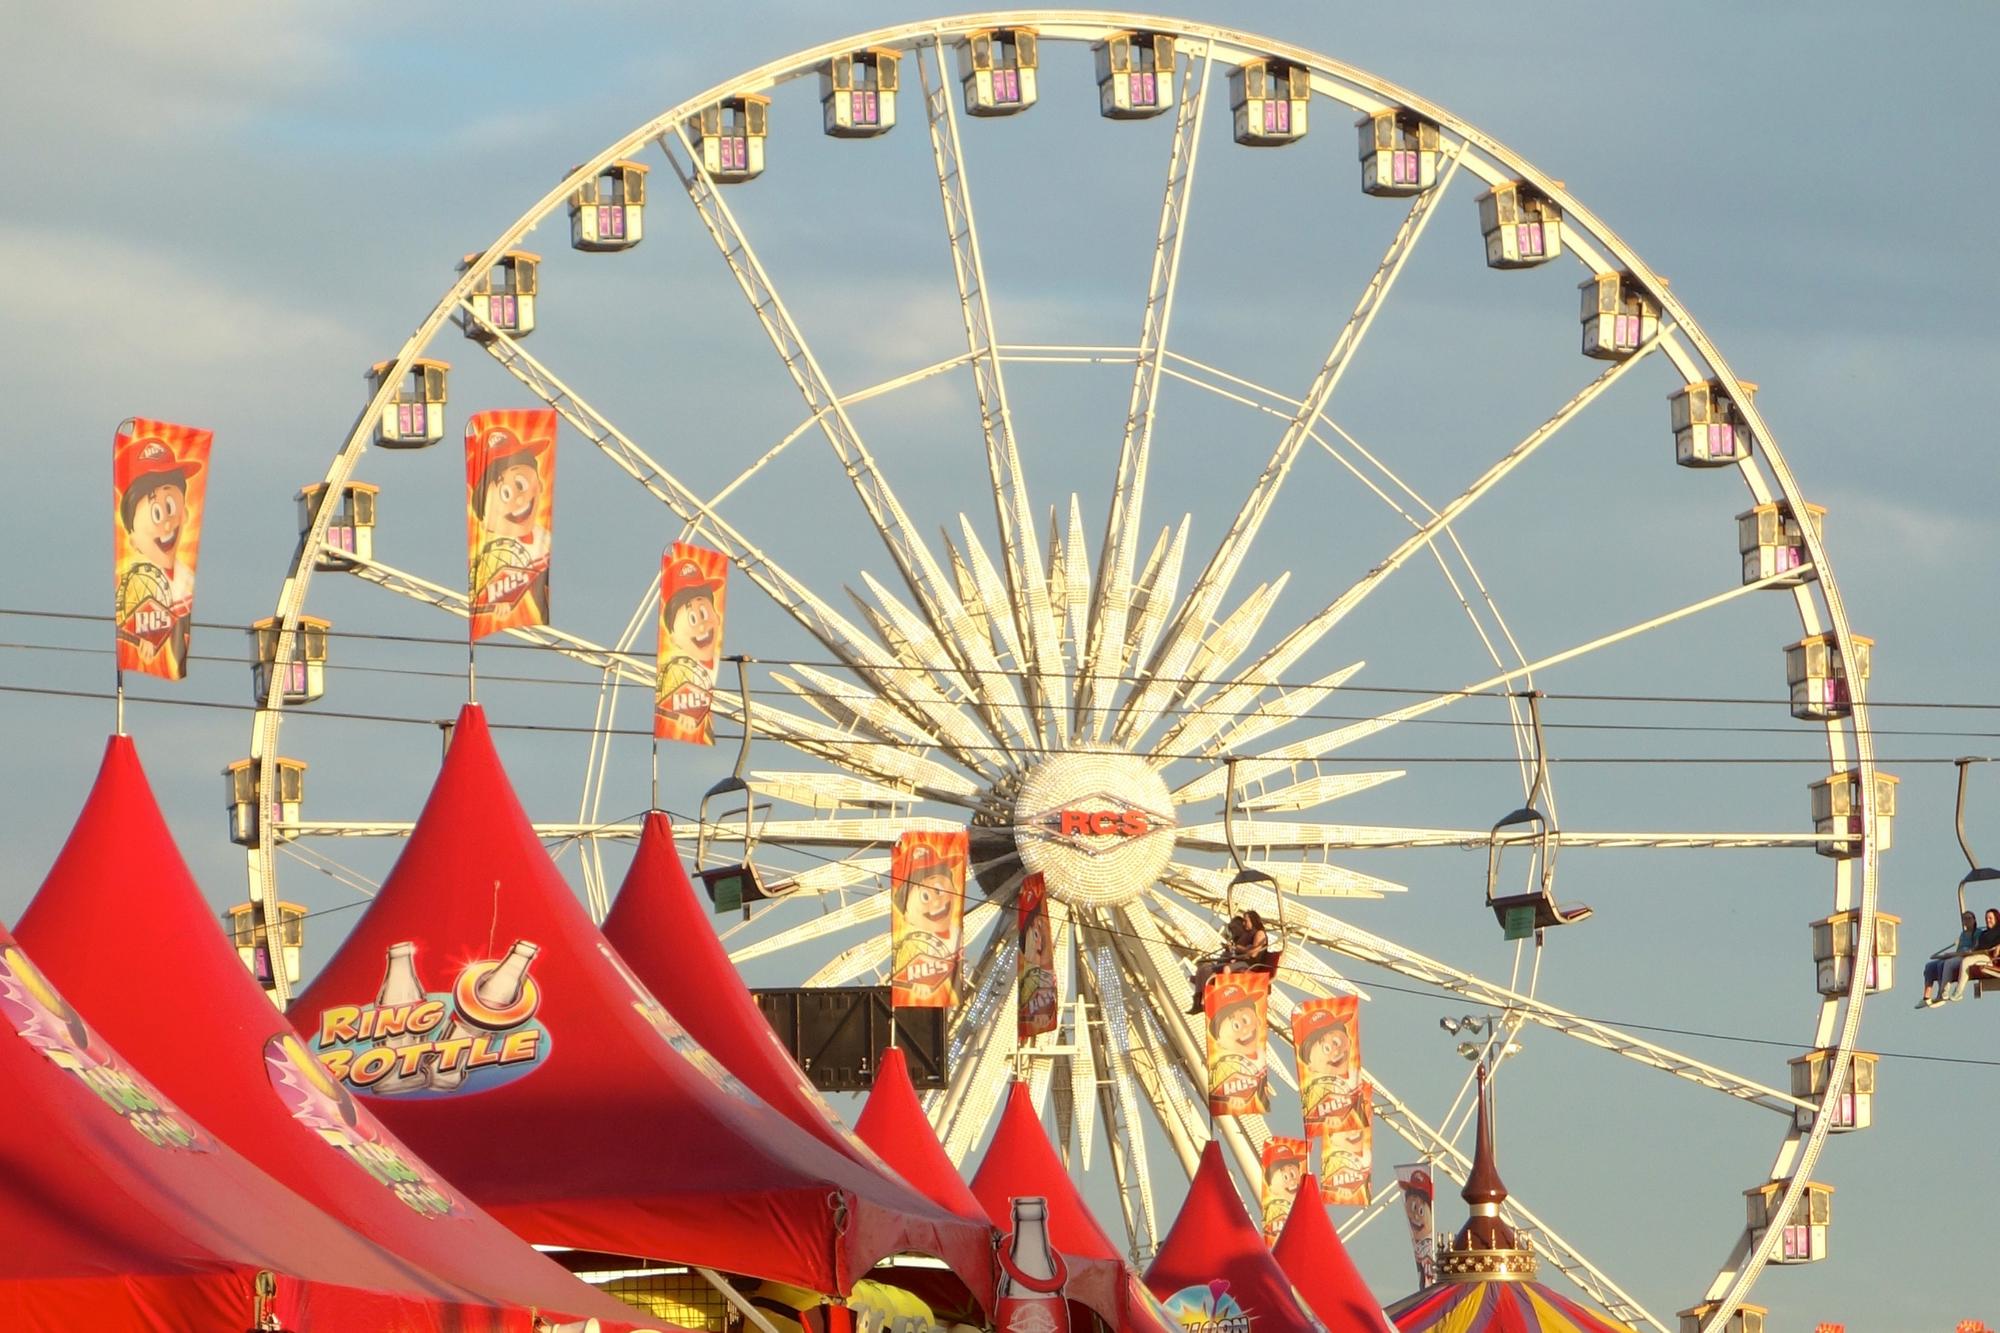 Ferris wheel at Arizona State Fair